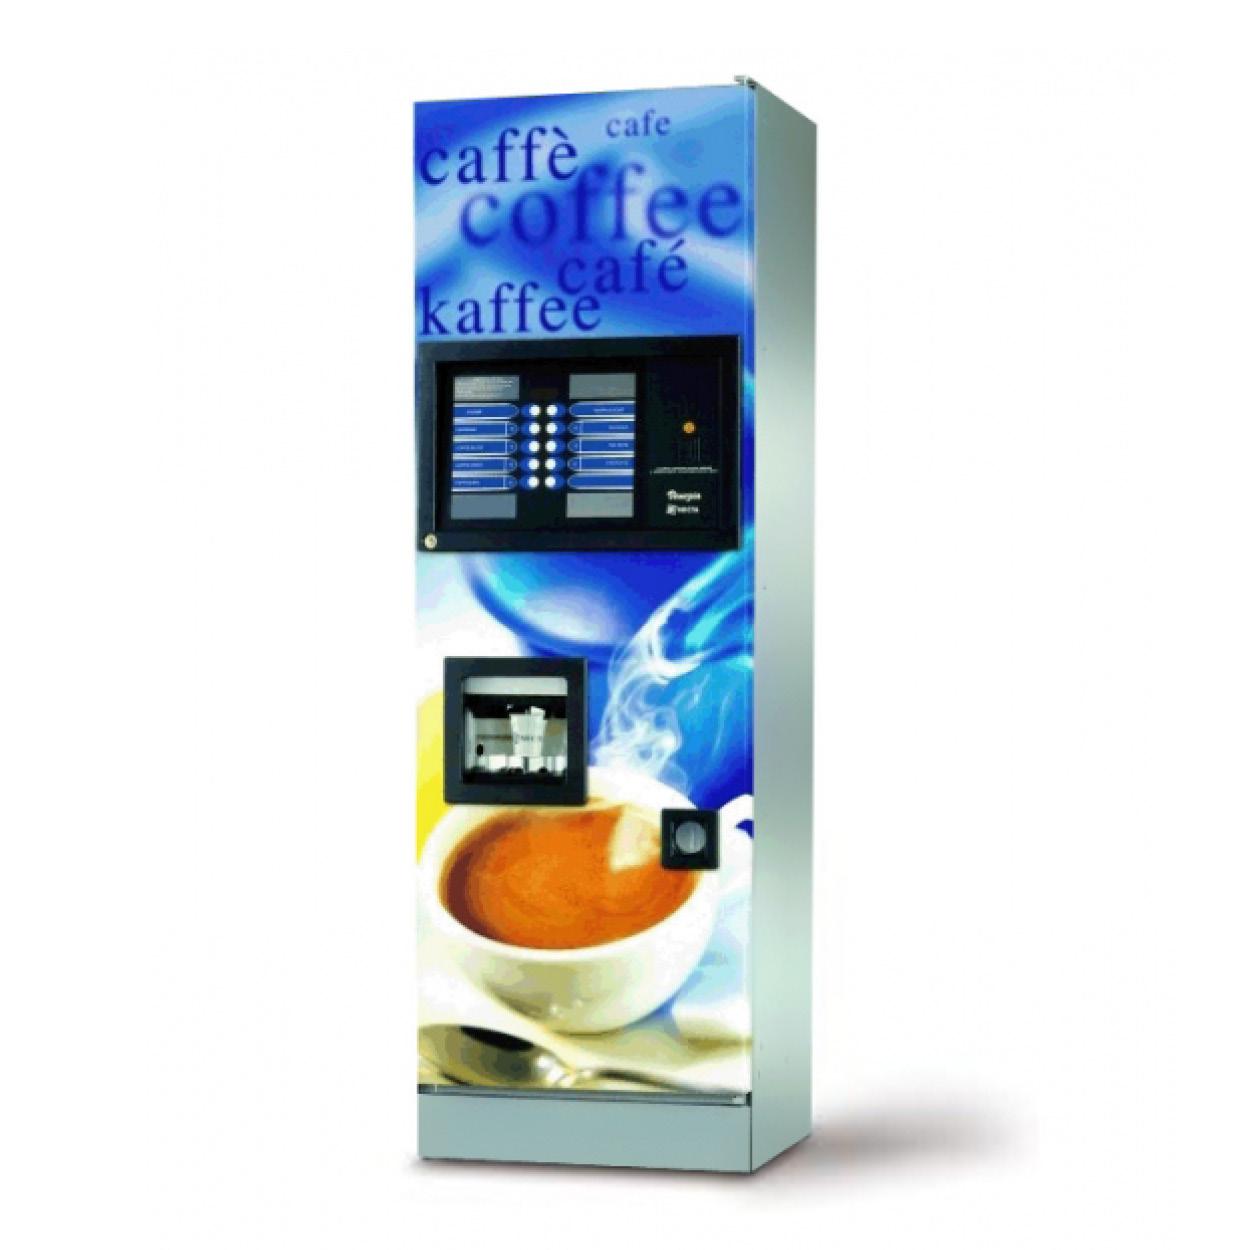 600x600px_Automaten_Schenk_Venezia